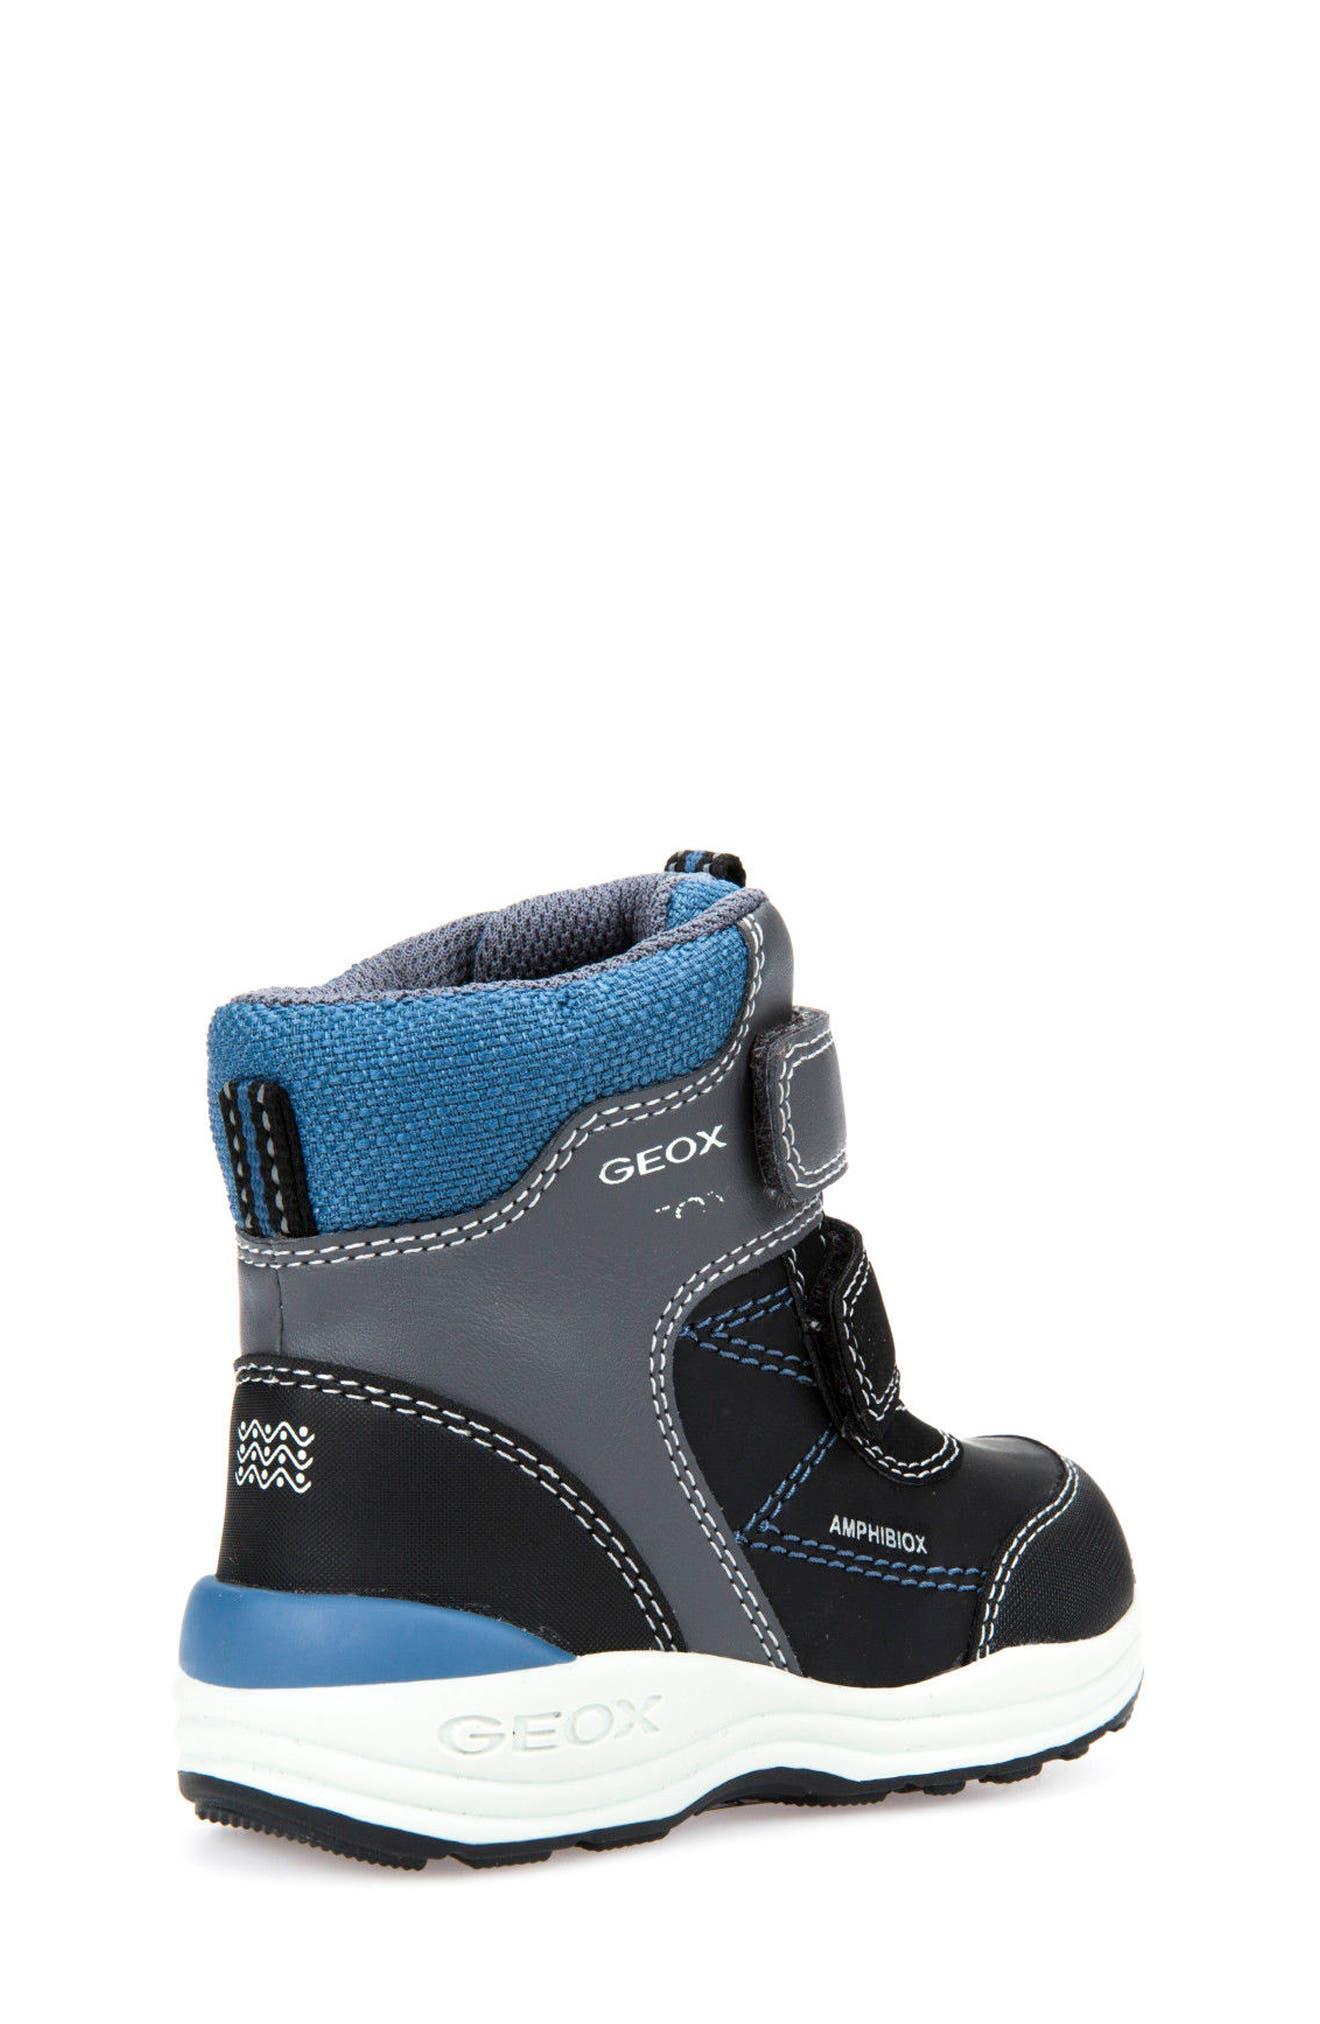 Gulp ABX Waterproof Boot,                             Alternate thumbnail 2, color,                             071